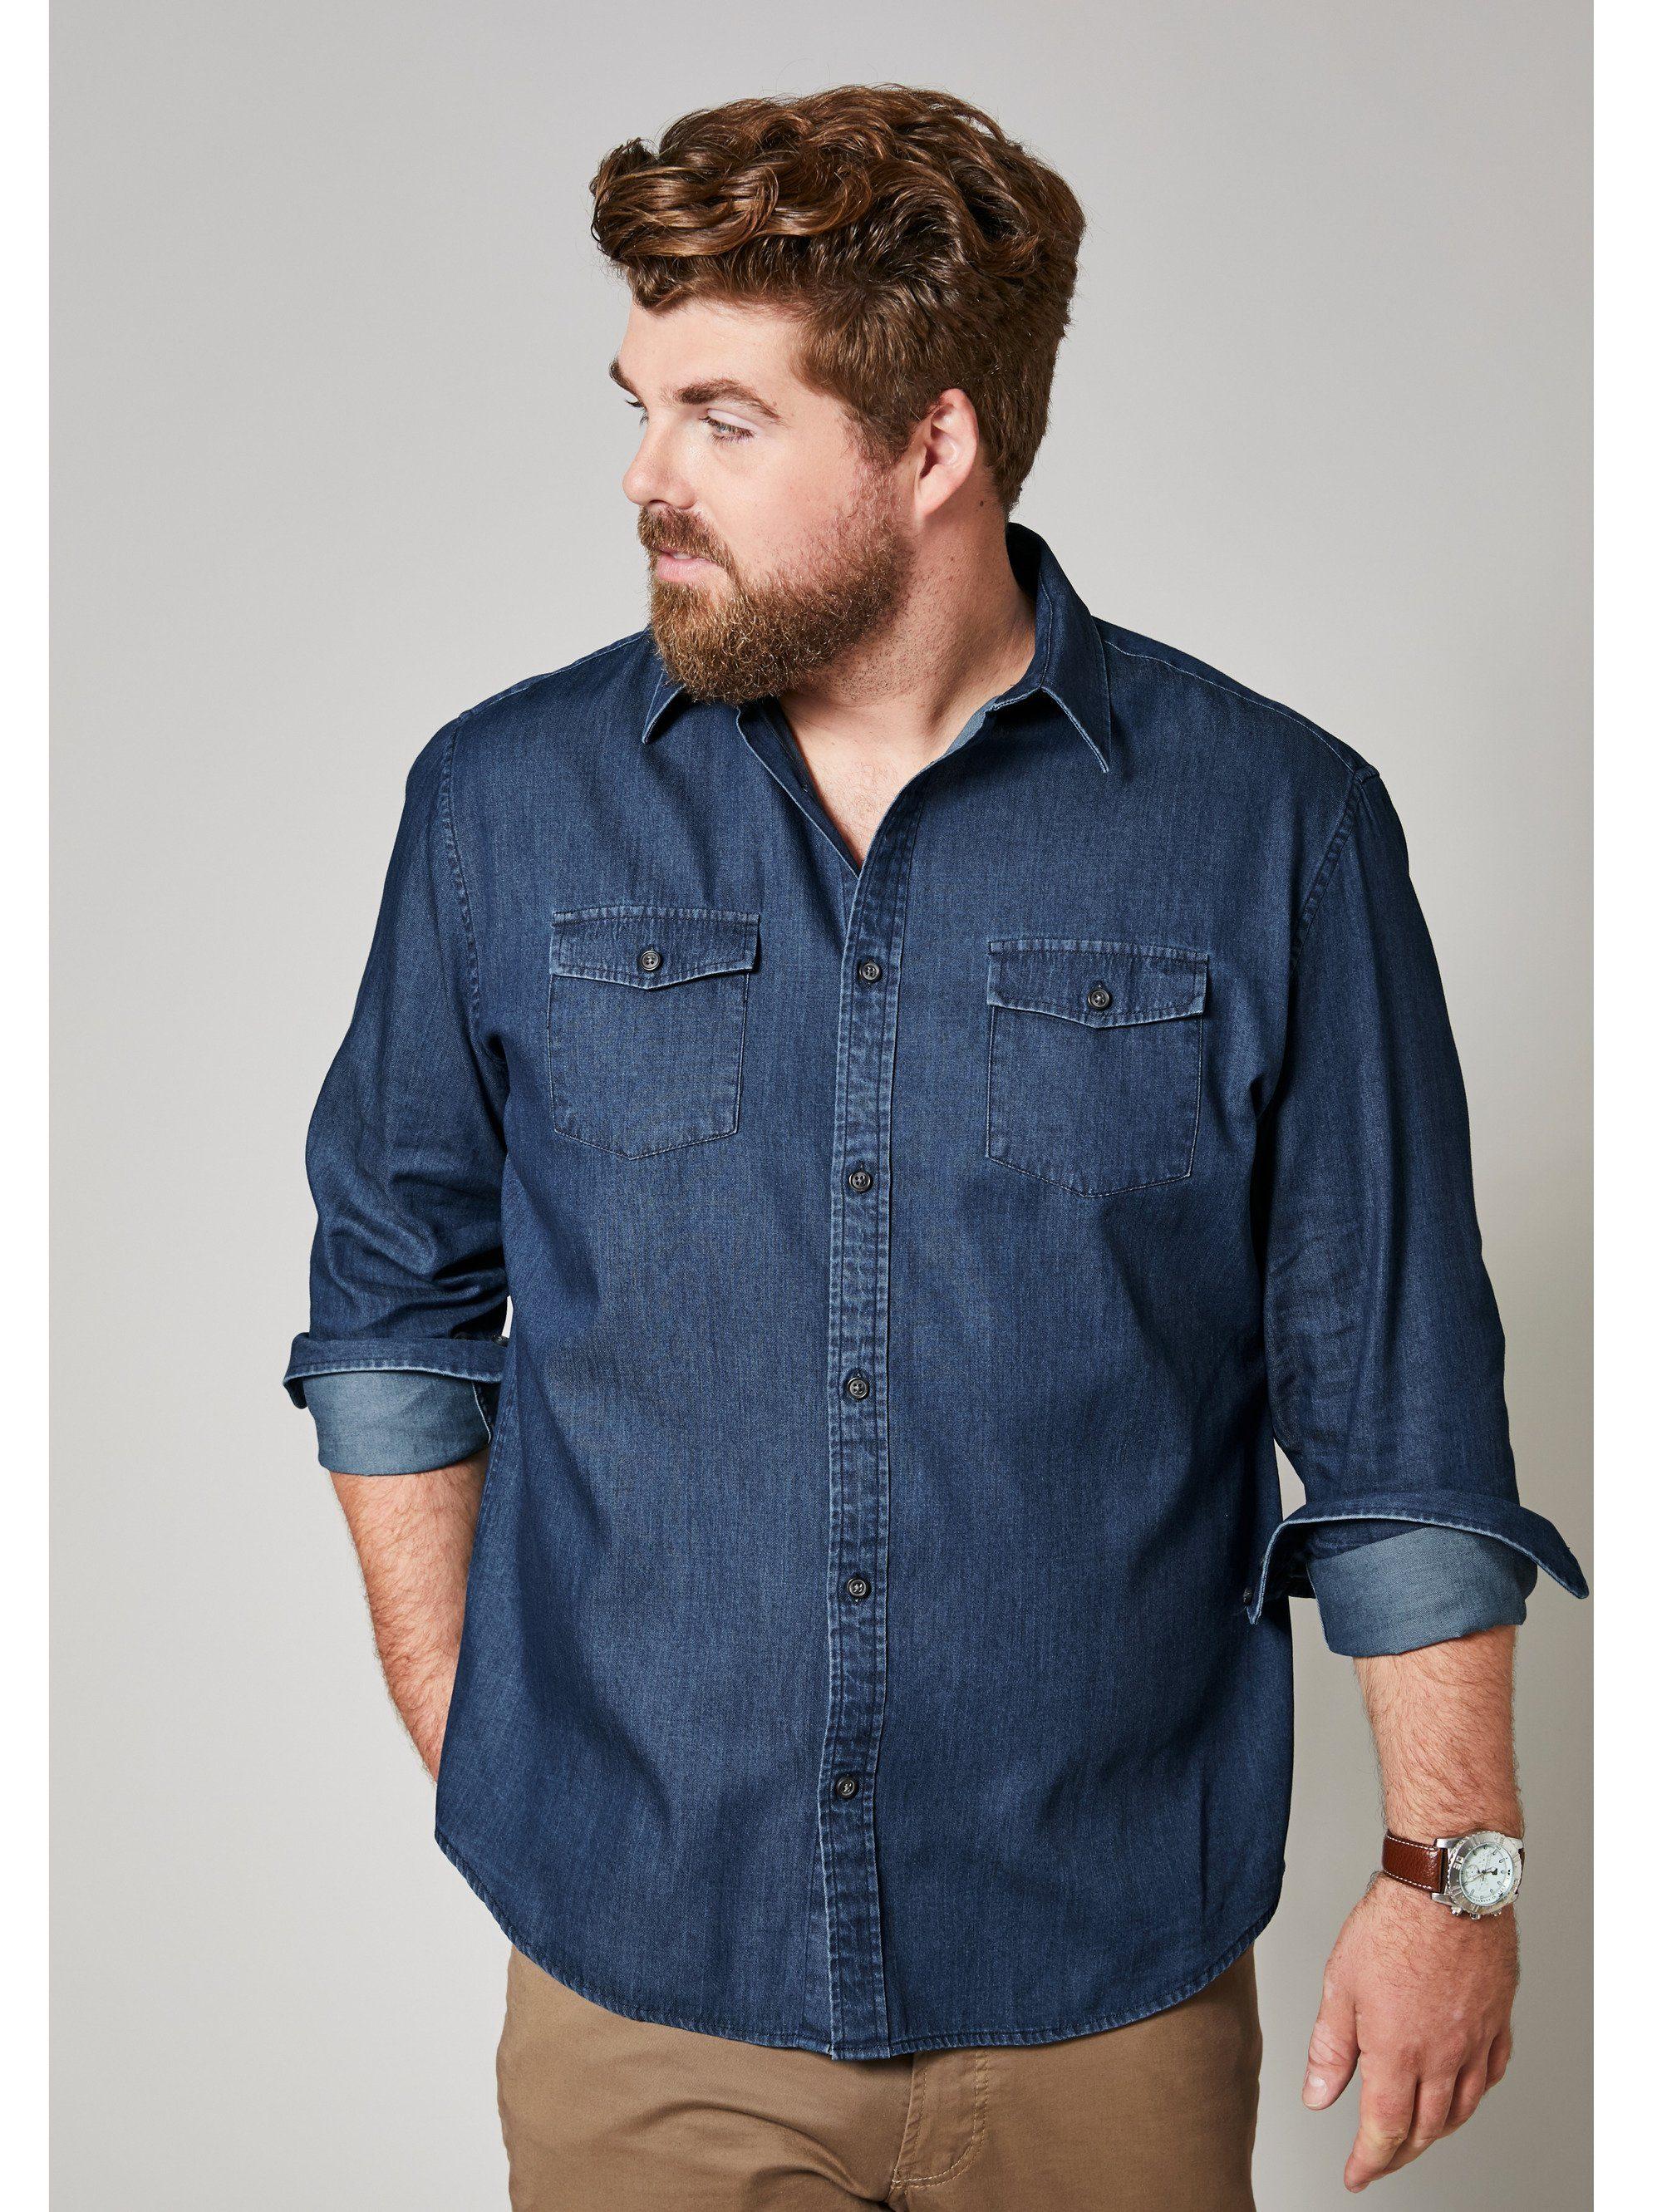 Men Plus by Happy Size Jeanshemd | Bekleidung > Hemden > Jeanshemden | Blau | Denim - Baumwolle | Men Plus By Happy Size